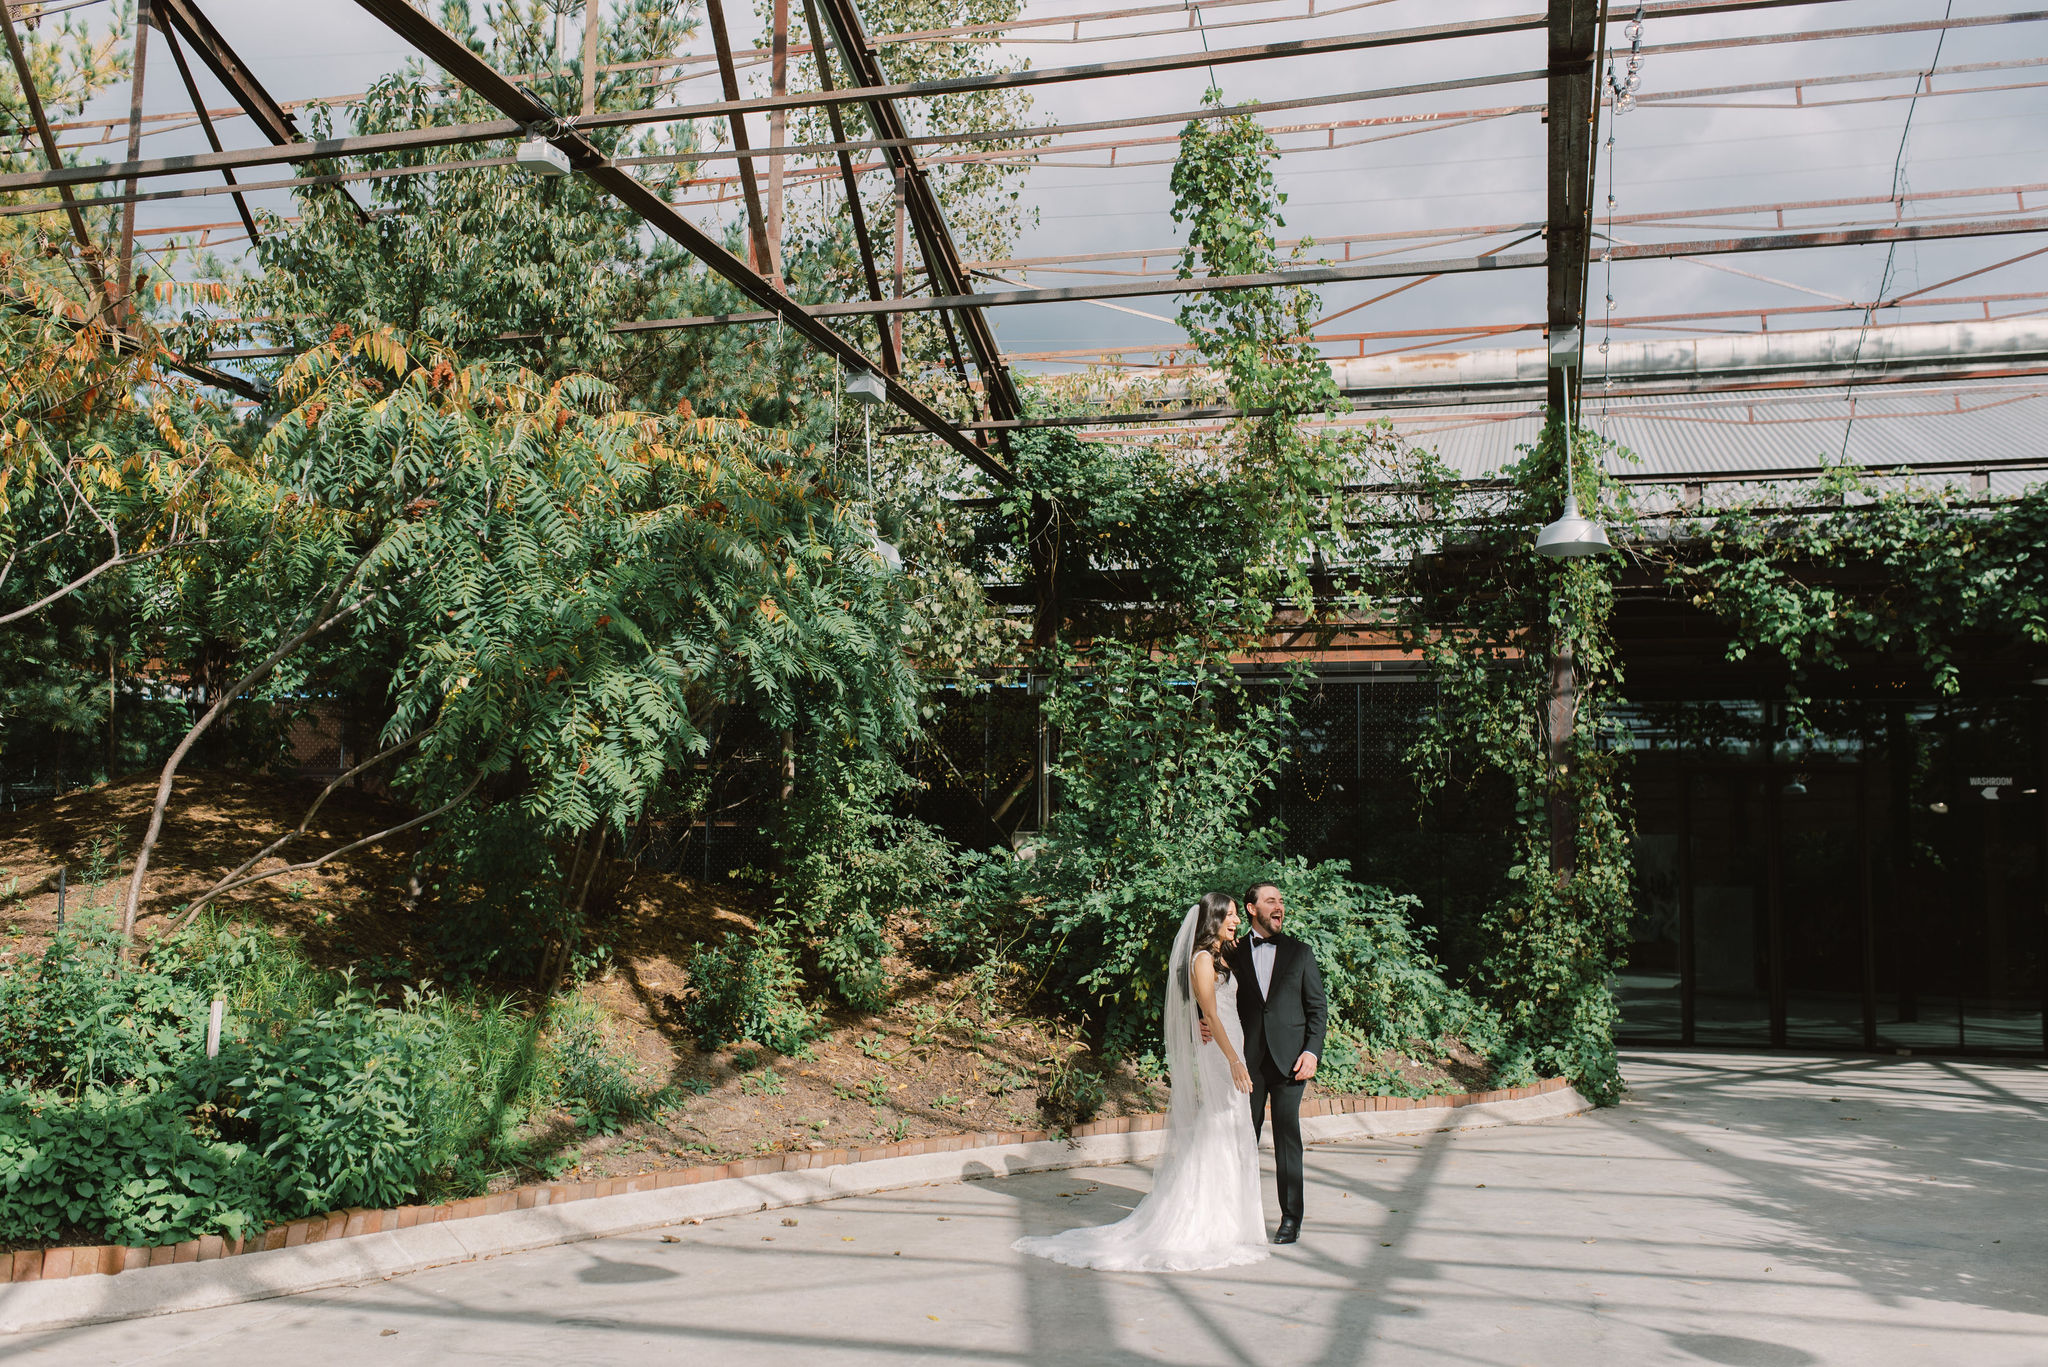 0431-artiese-evergreen-brickworks-wedding-ashleycraig-26609.jpg